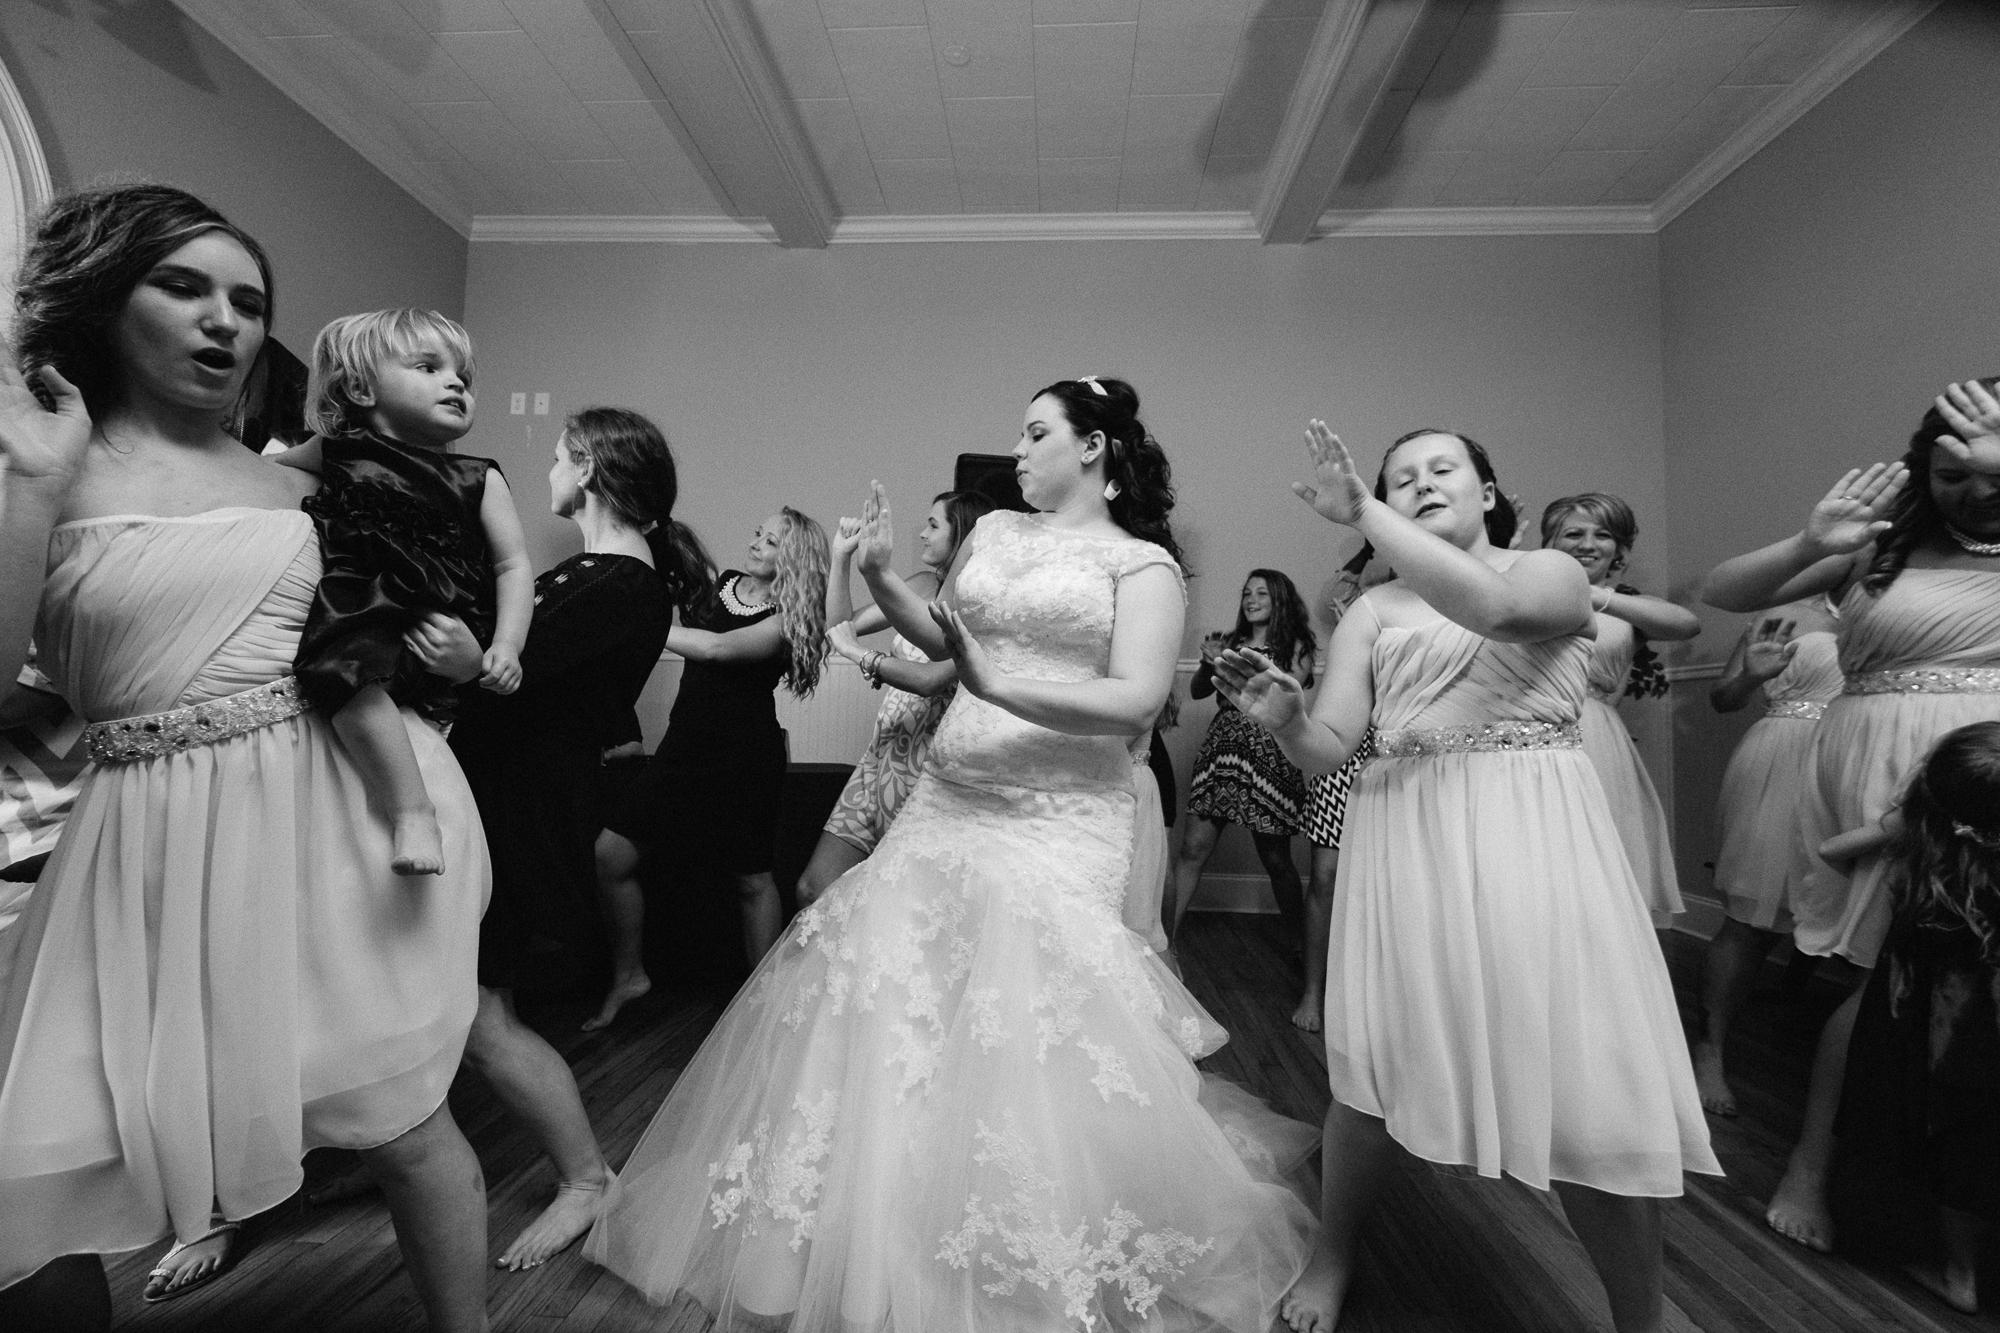 Emily-Shay-wedding-blog-30.jpg